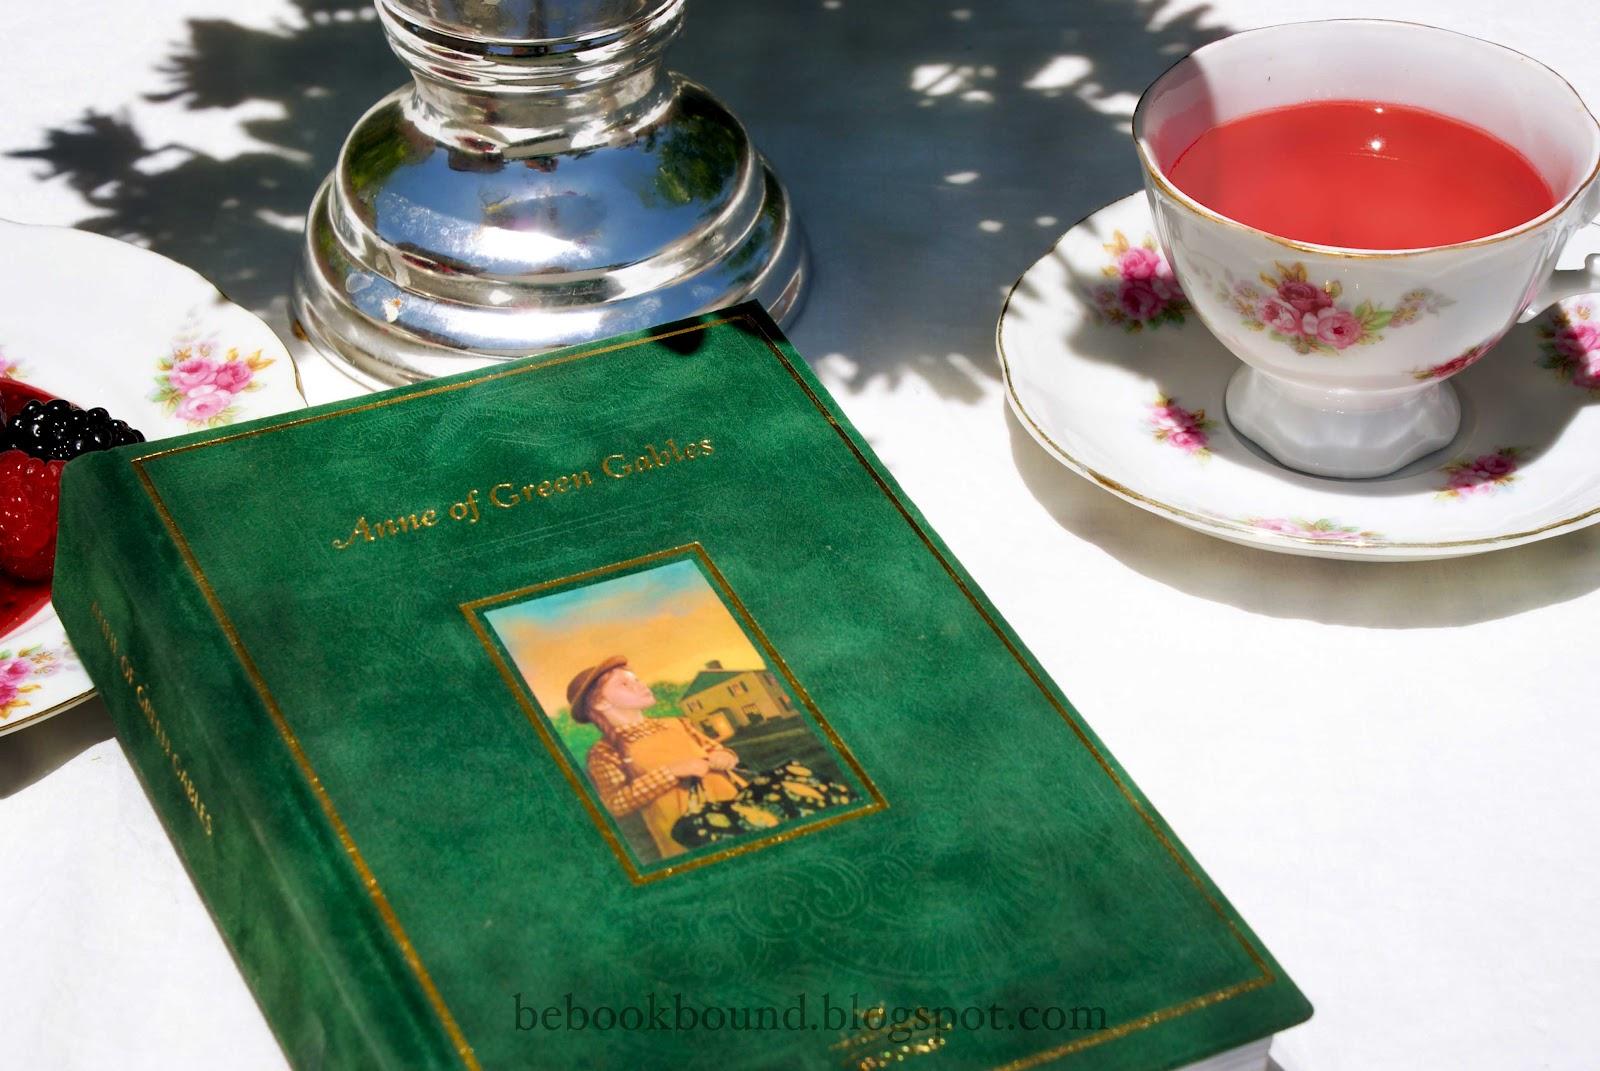 Be Book Bound Anne Of Green Gables A Garden Tour